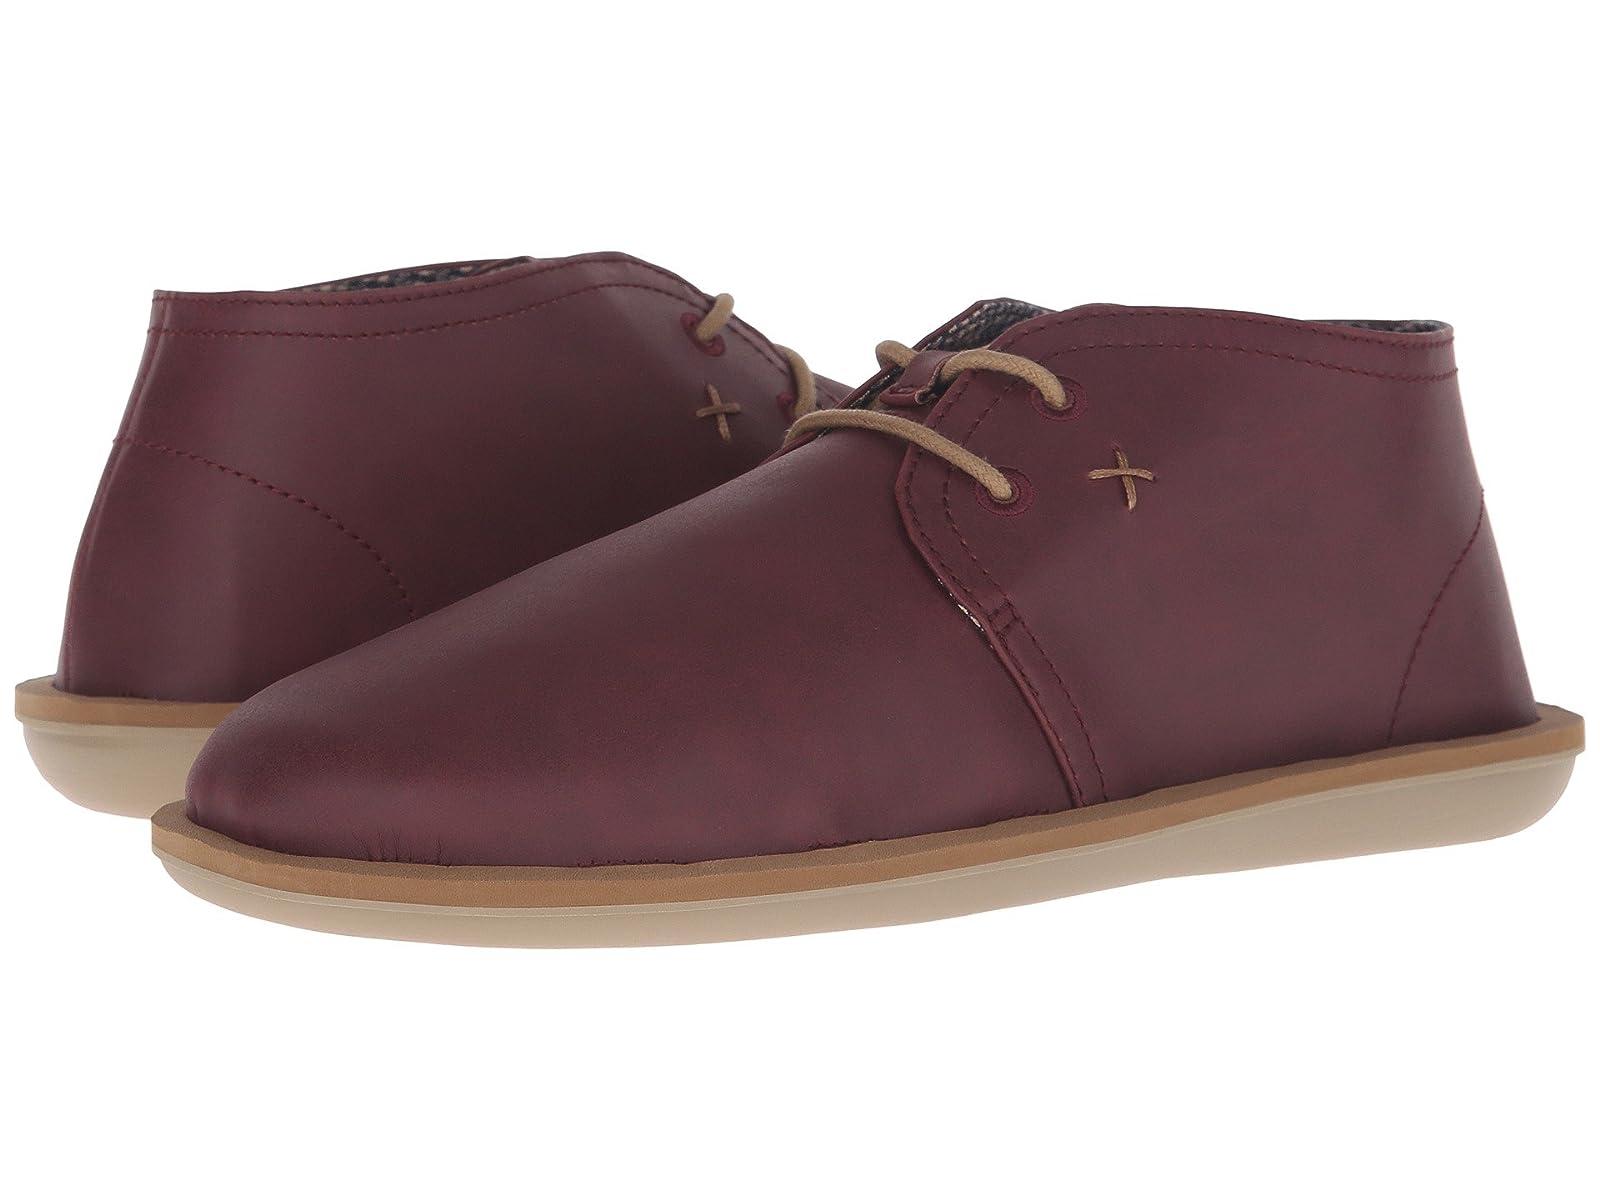 Sanuk Koda SelectCheap and distinctive eye-catching shoes